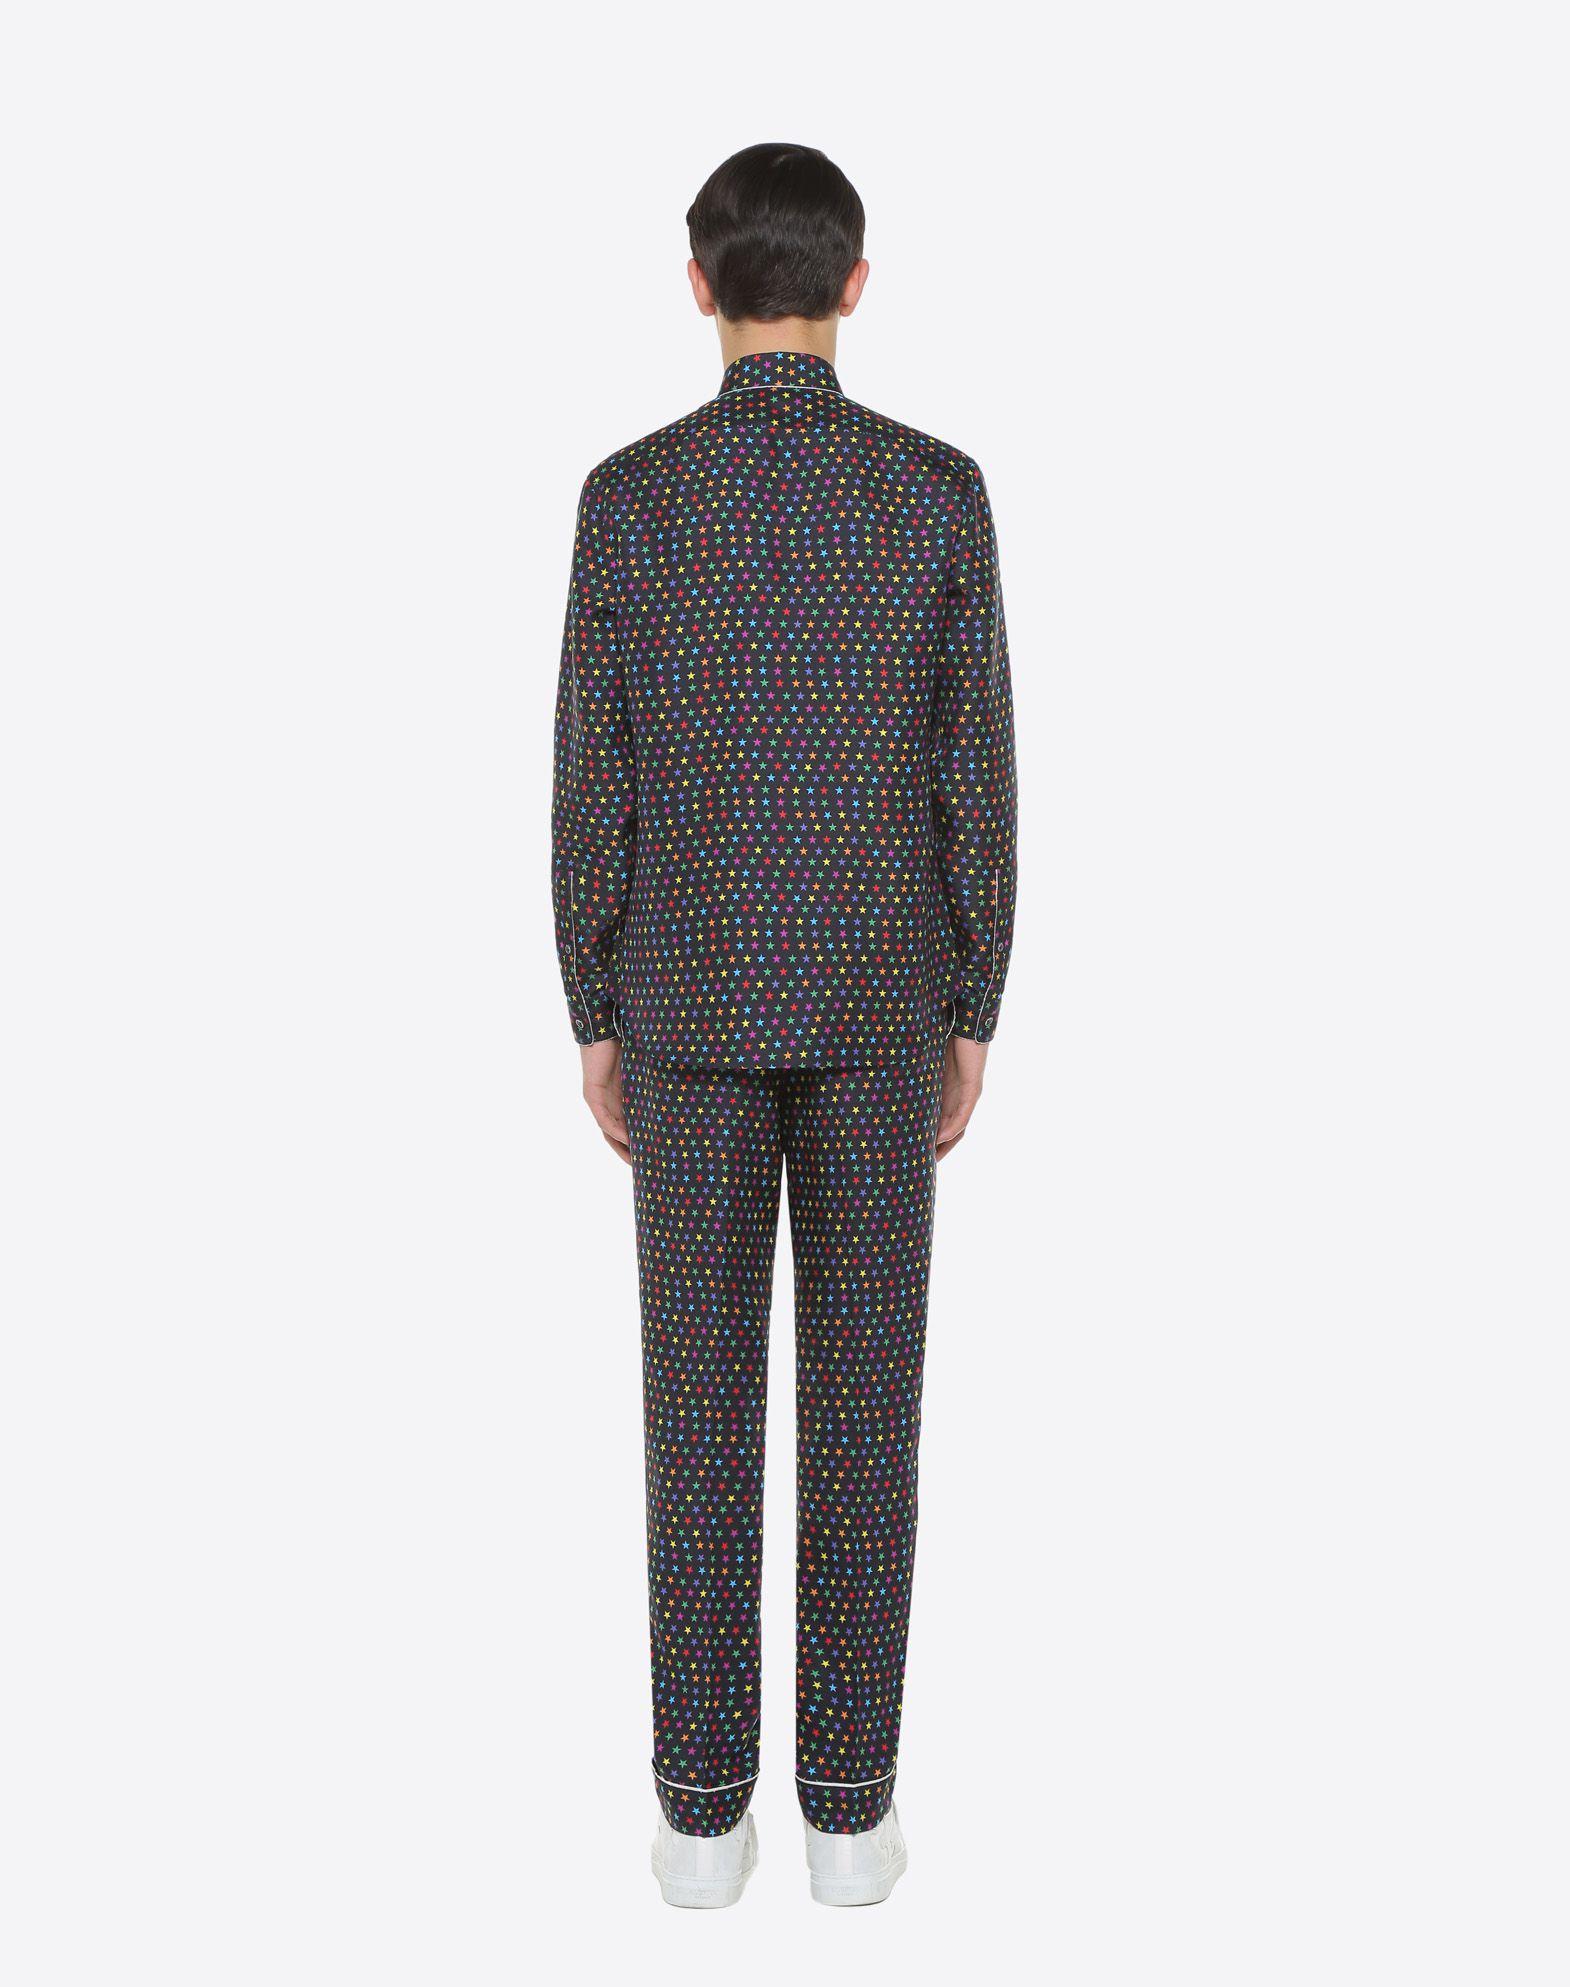 VALENTINO UOMO Pantalón pijama de seda con estampado de estrellas Pantalón U e